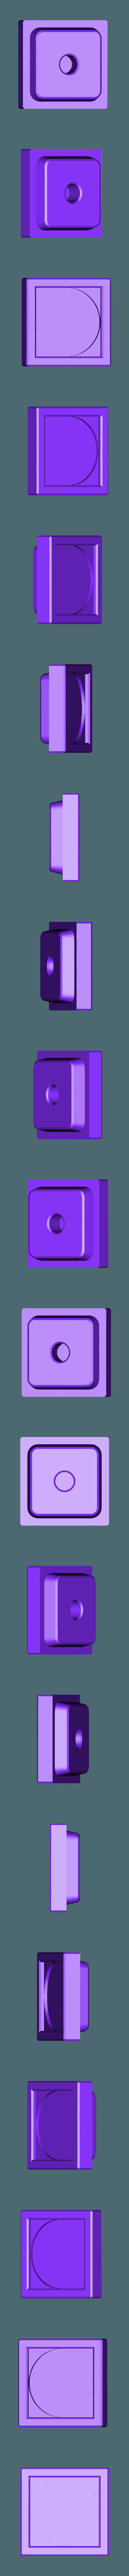 28mm_mini_case_dice_box_square.stl Download free STL file 28mm mini plinth remix; featuring name plates • Object to 3D print, daftpirate15